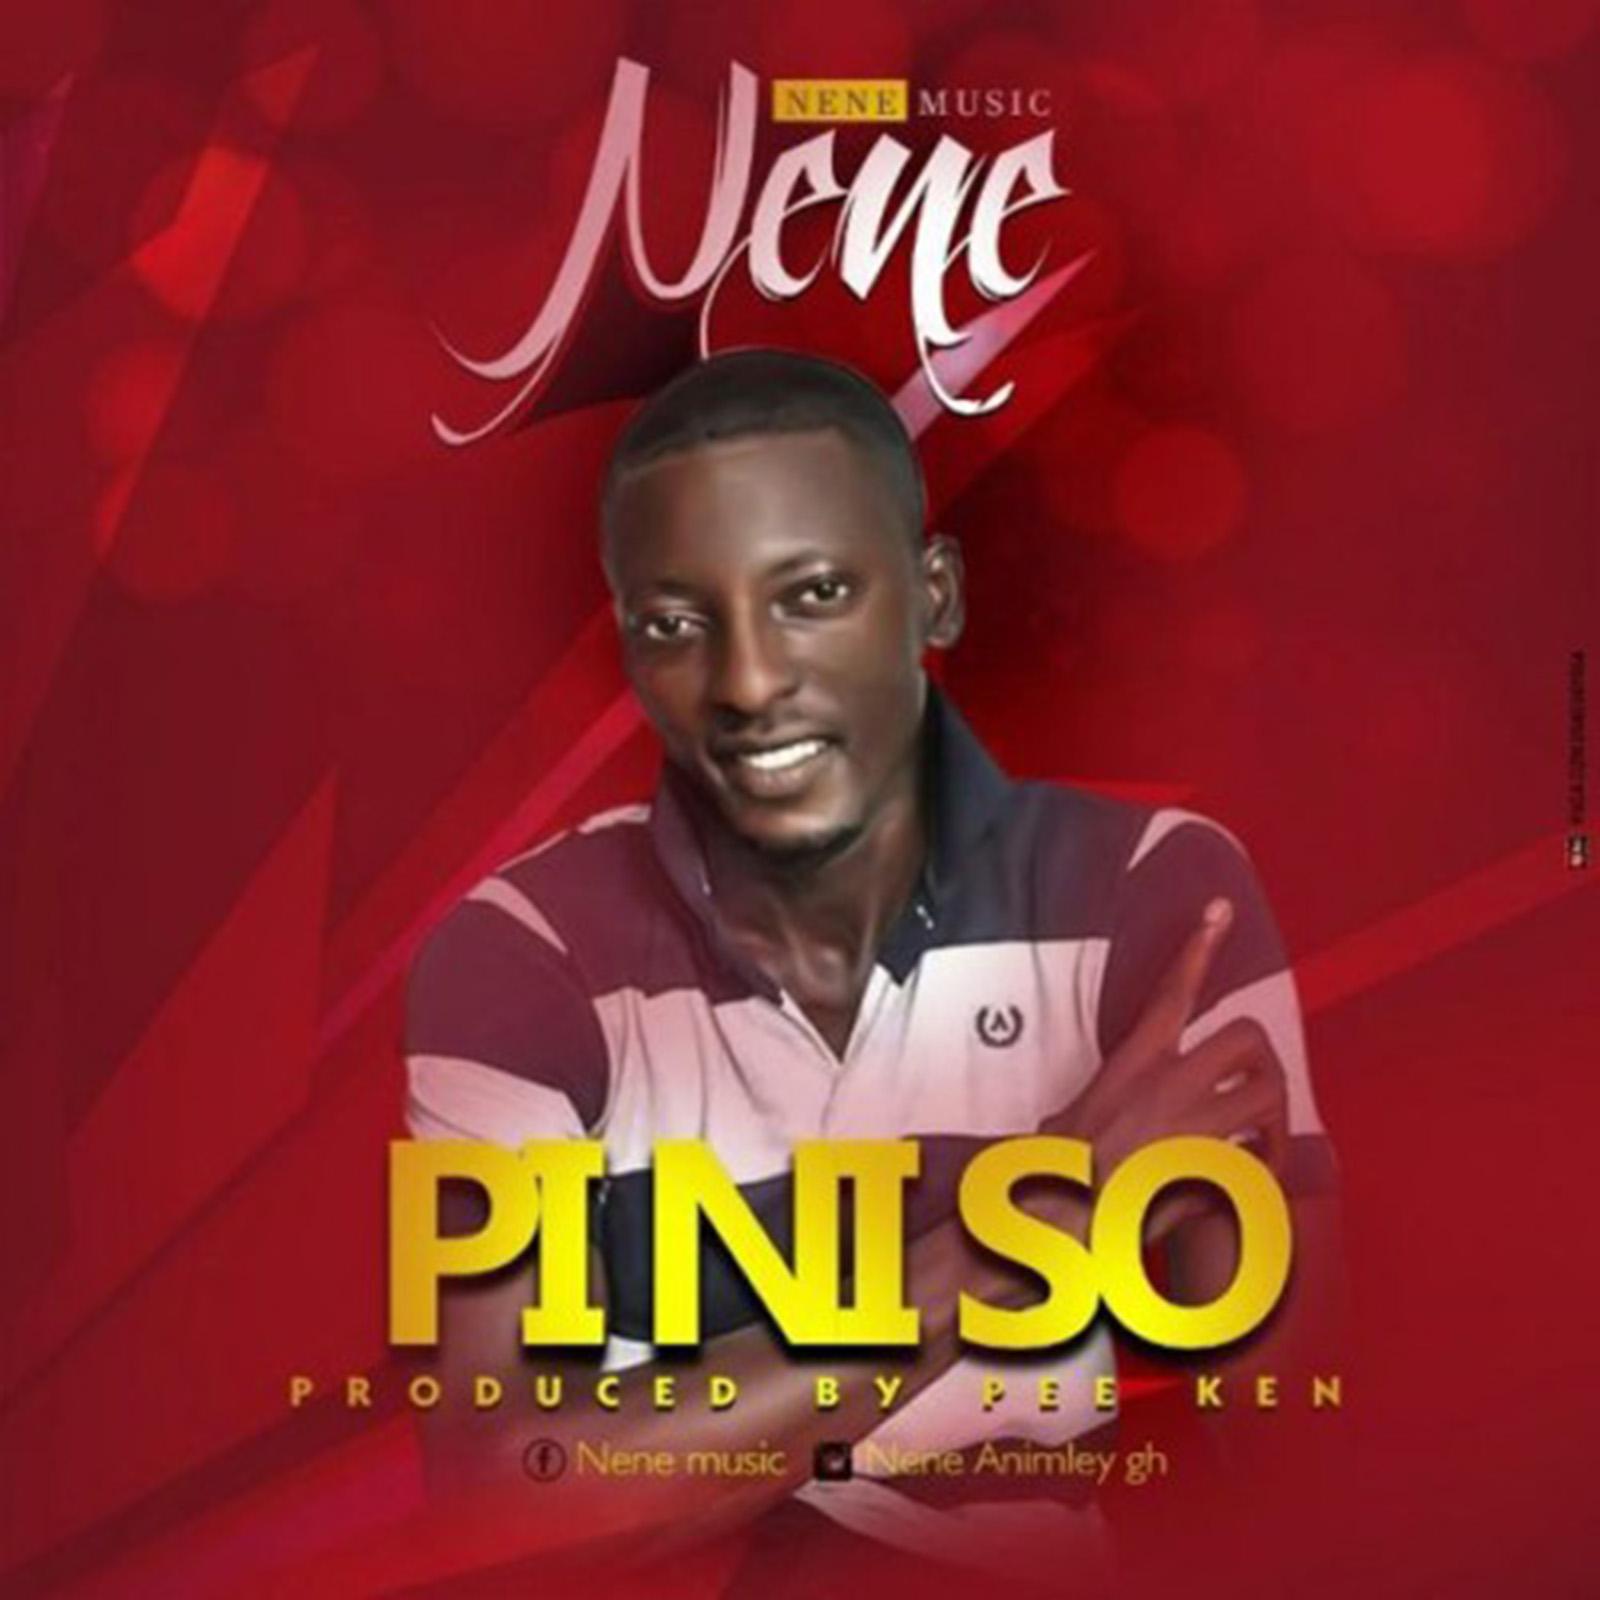 Piniso by Nene